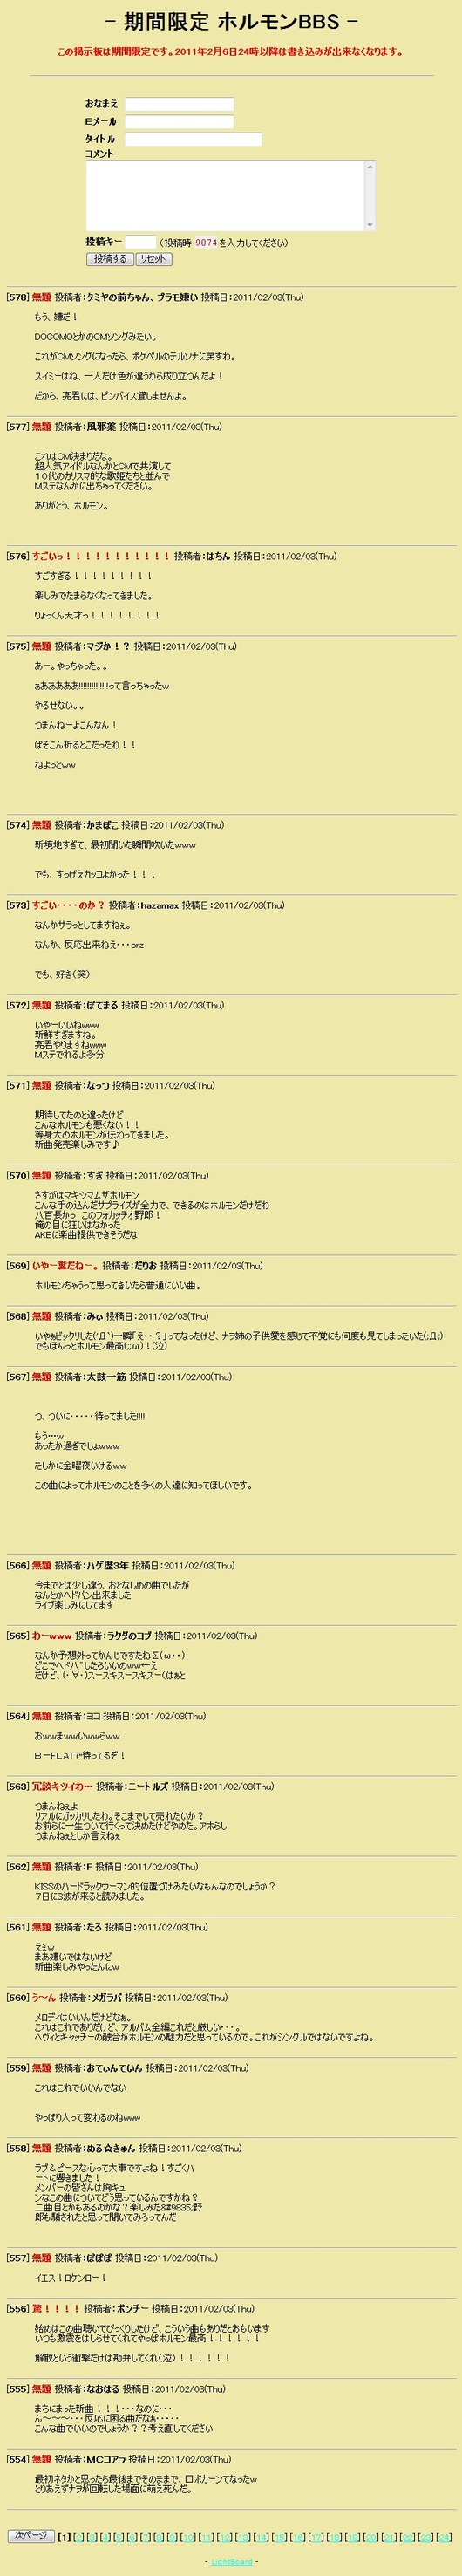 2011-02-03_231258